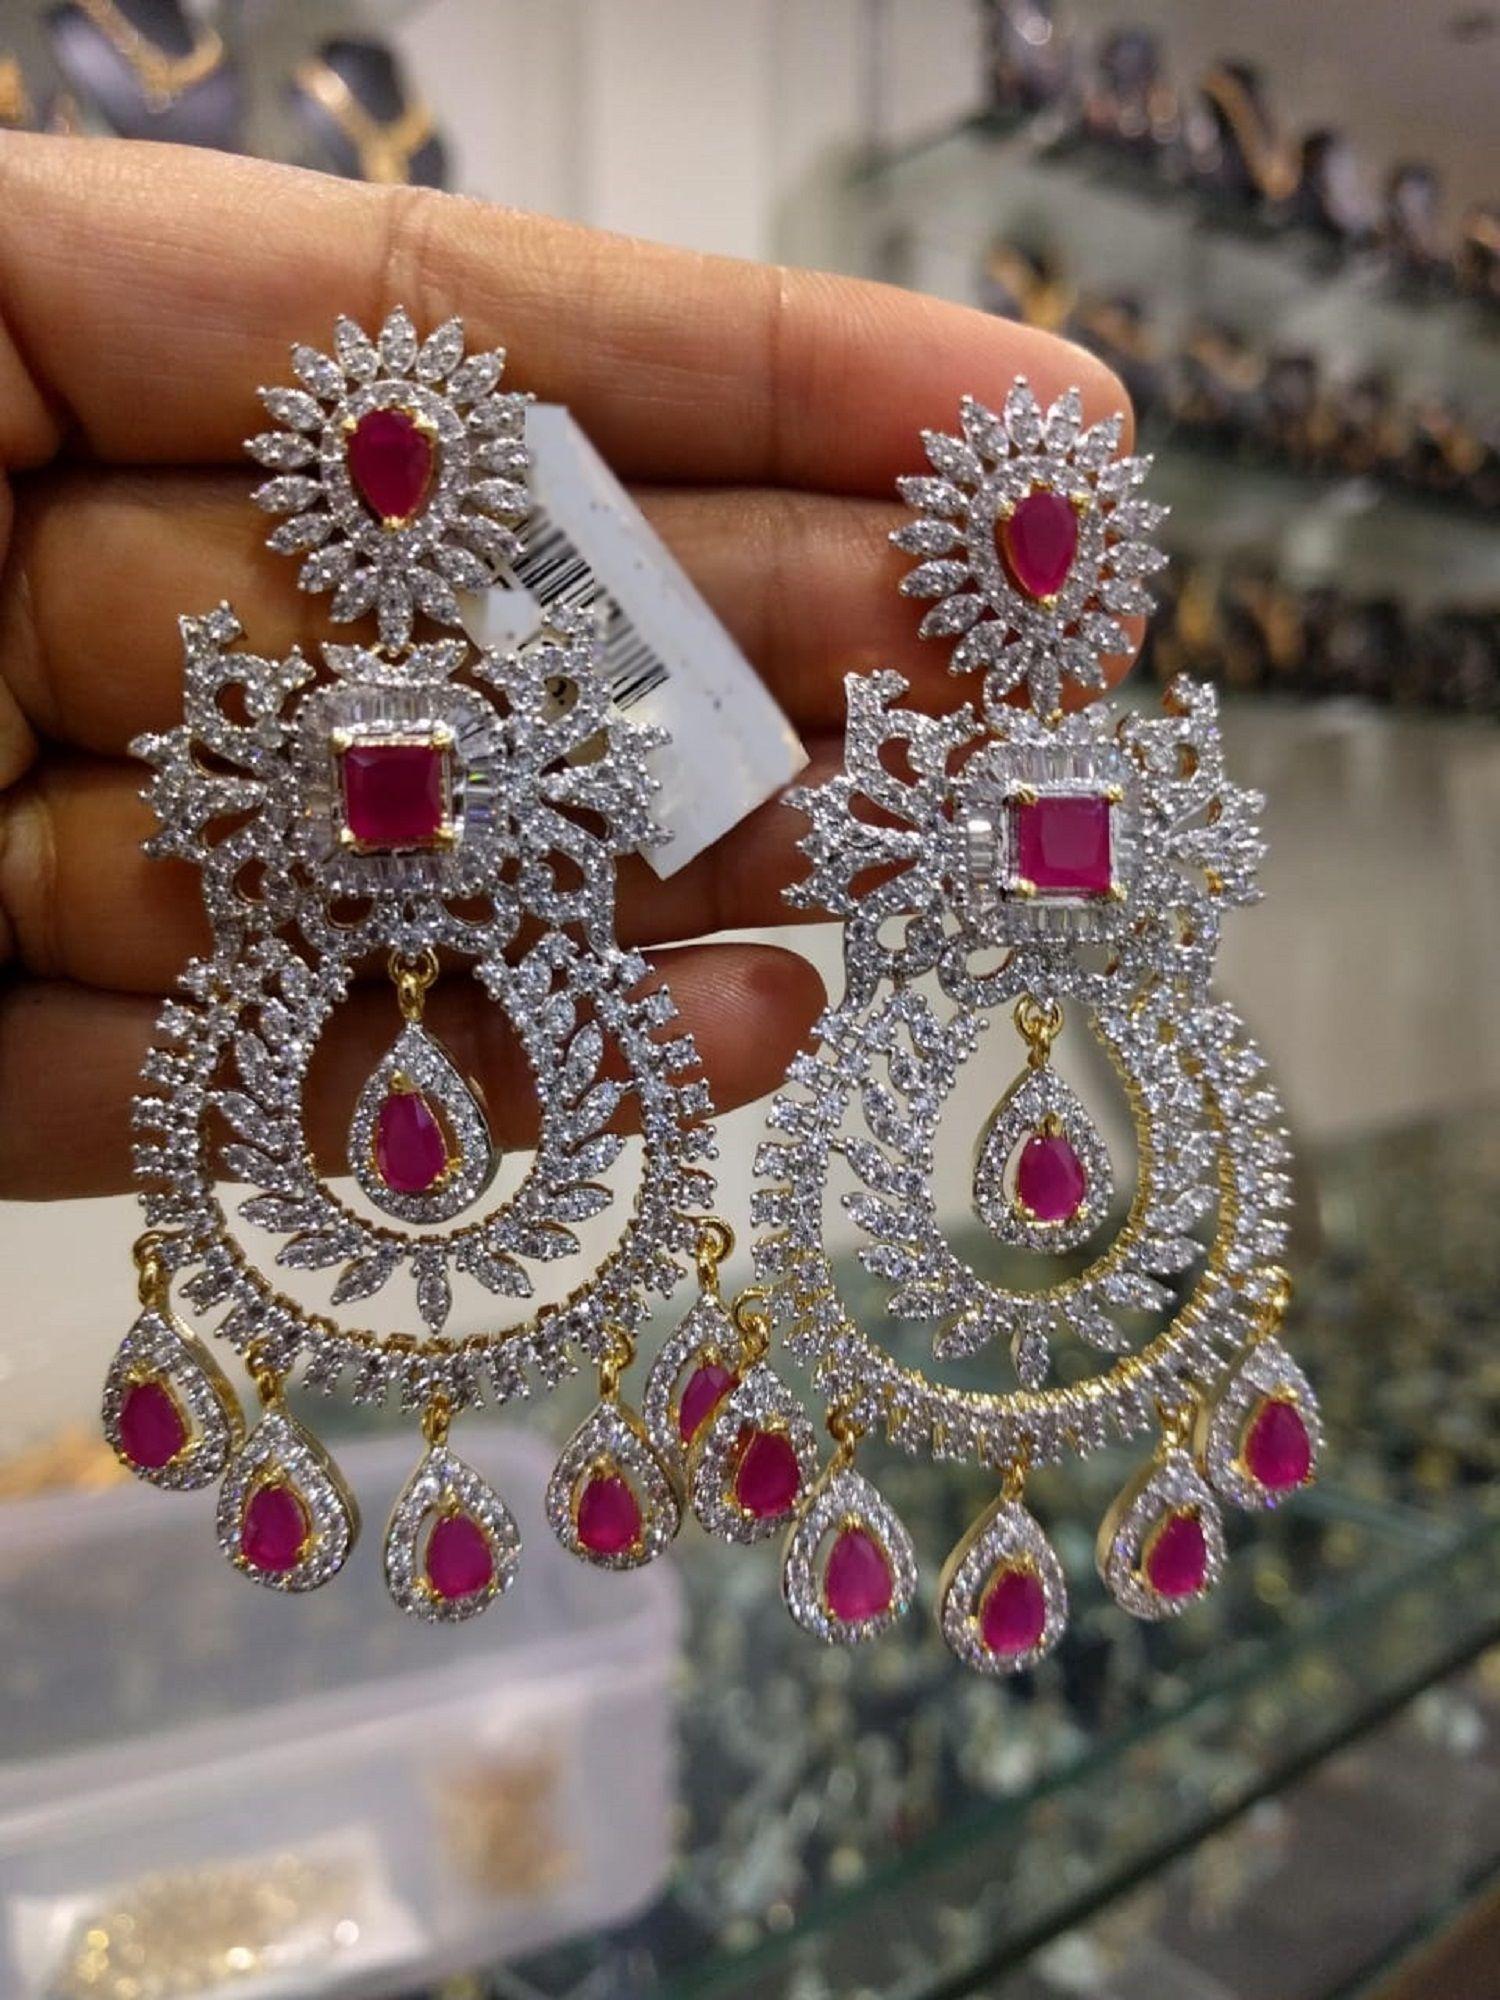 1 Gm gold earrings or trendy earrings